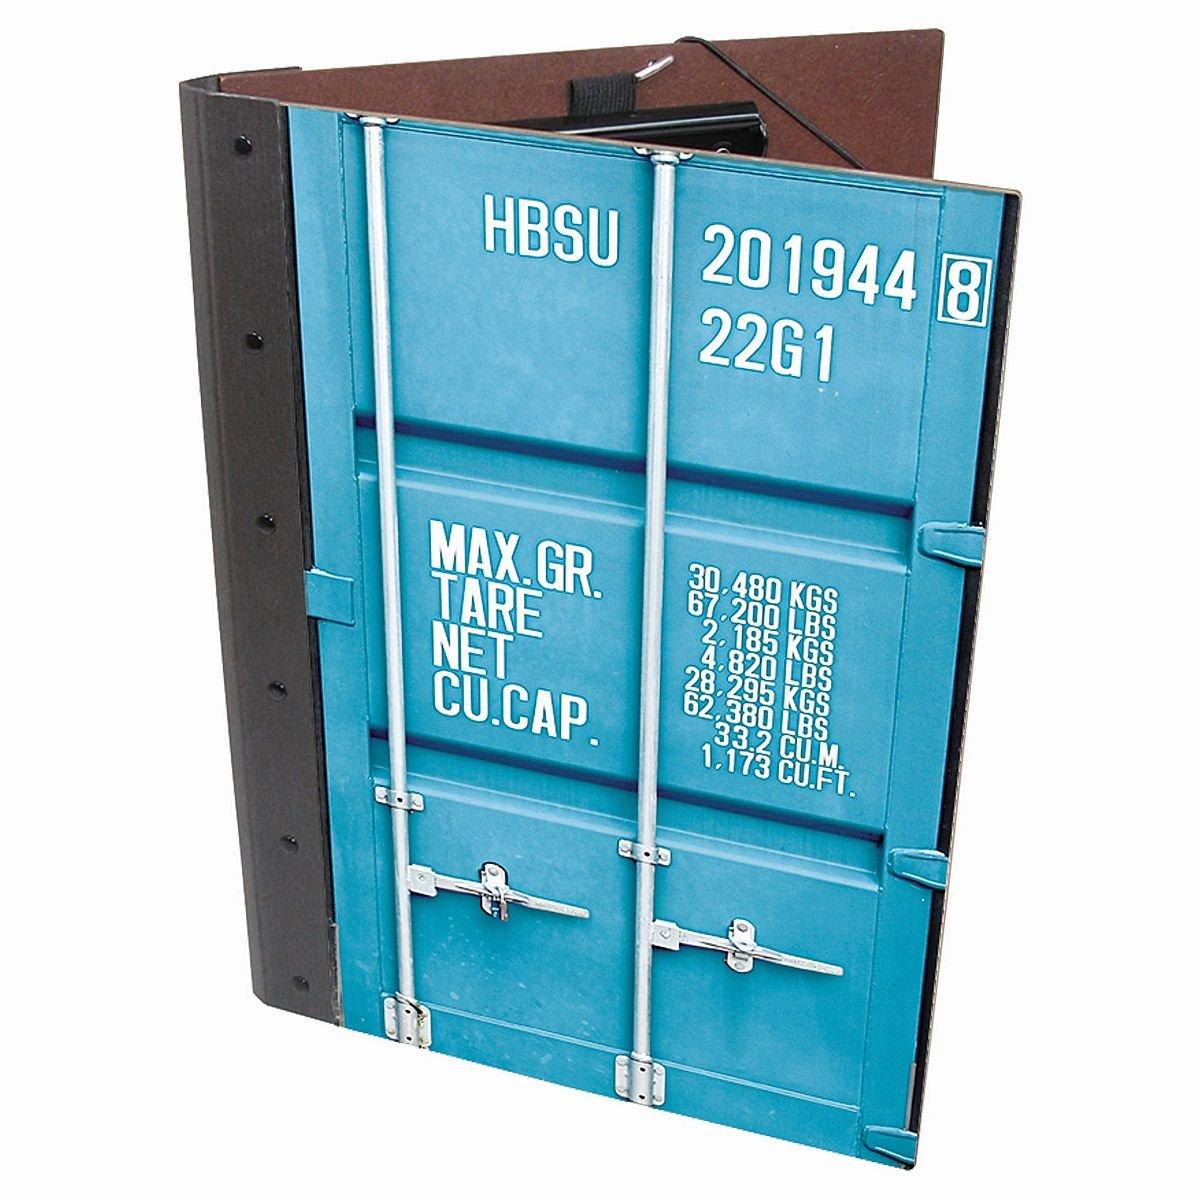 Werkhaus CO1053 T/ürkis Mappe mit Cliphalter in Container-Optik